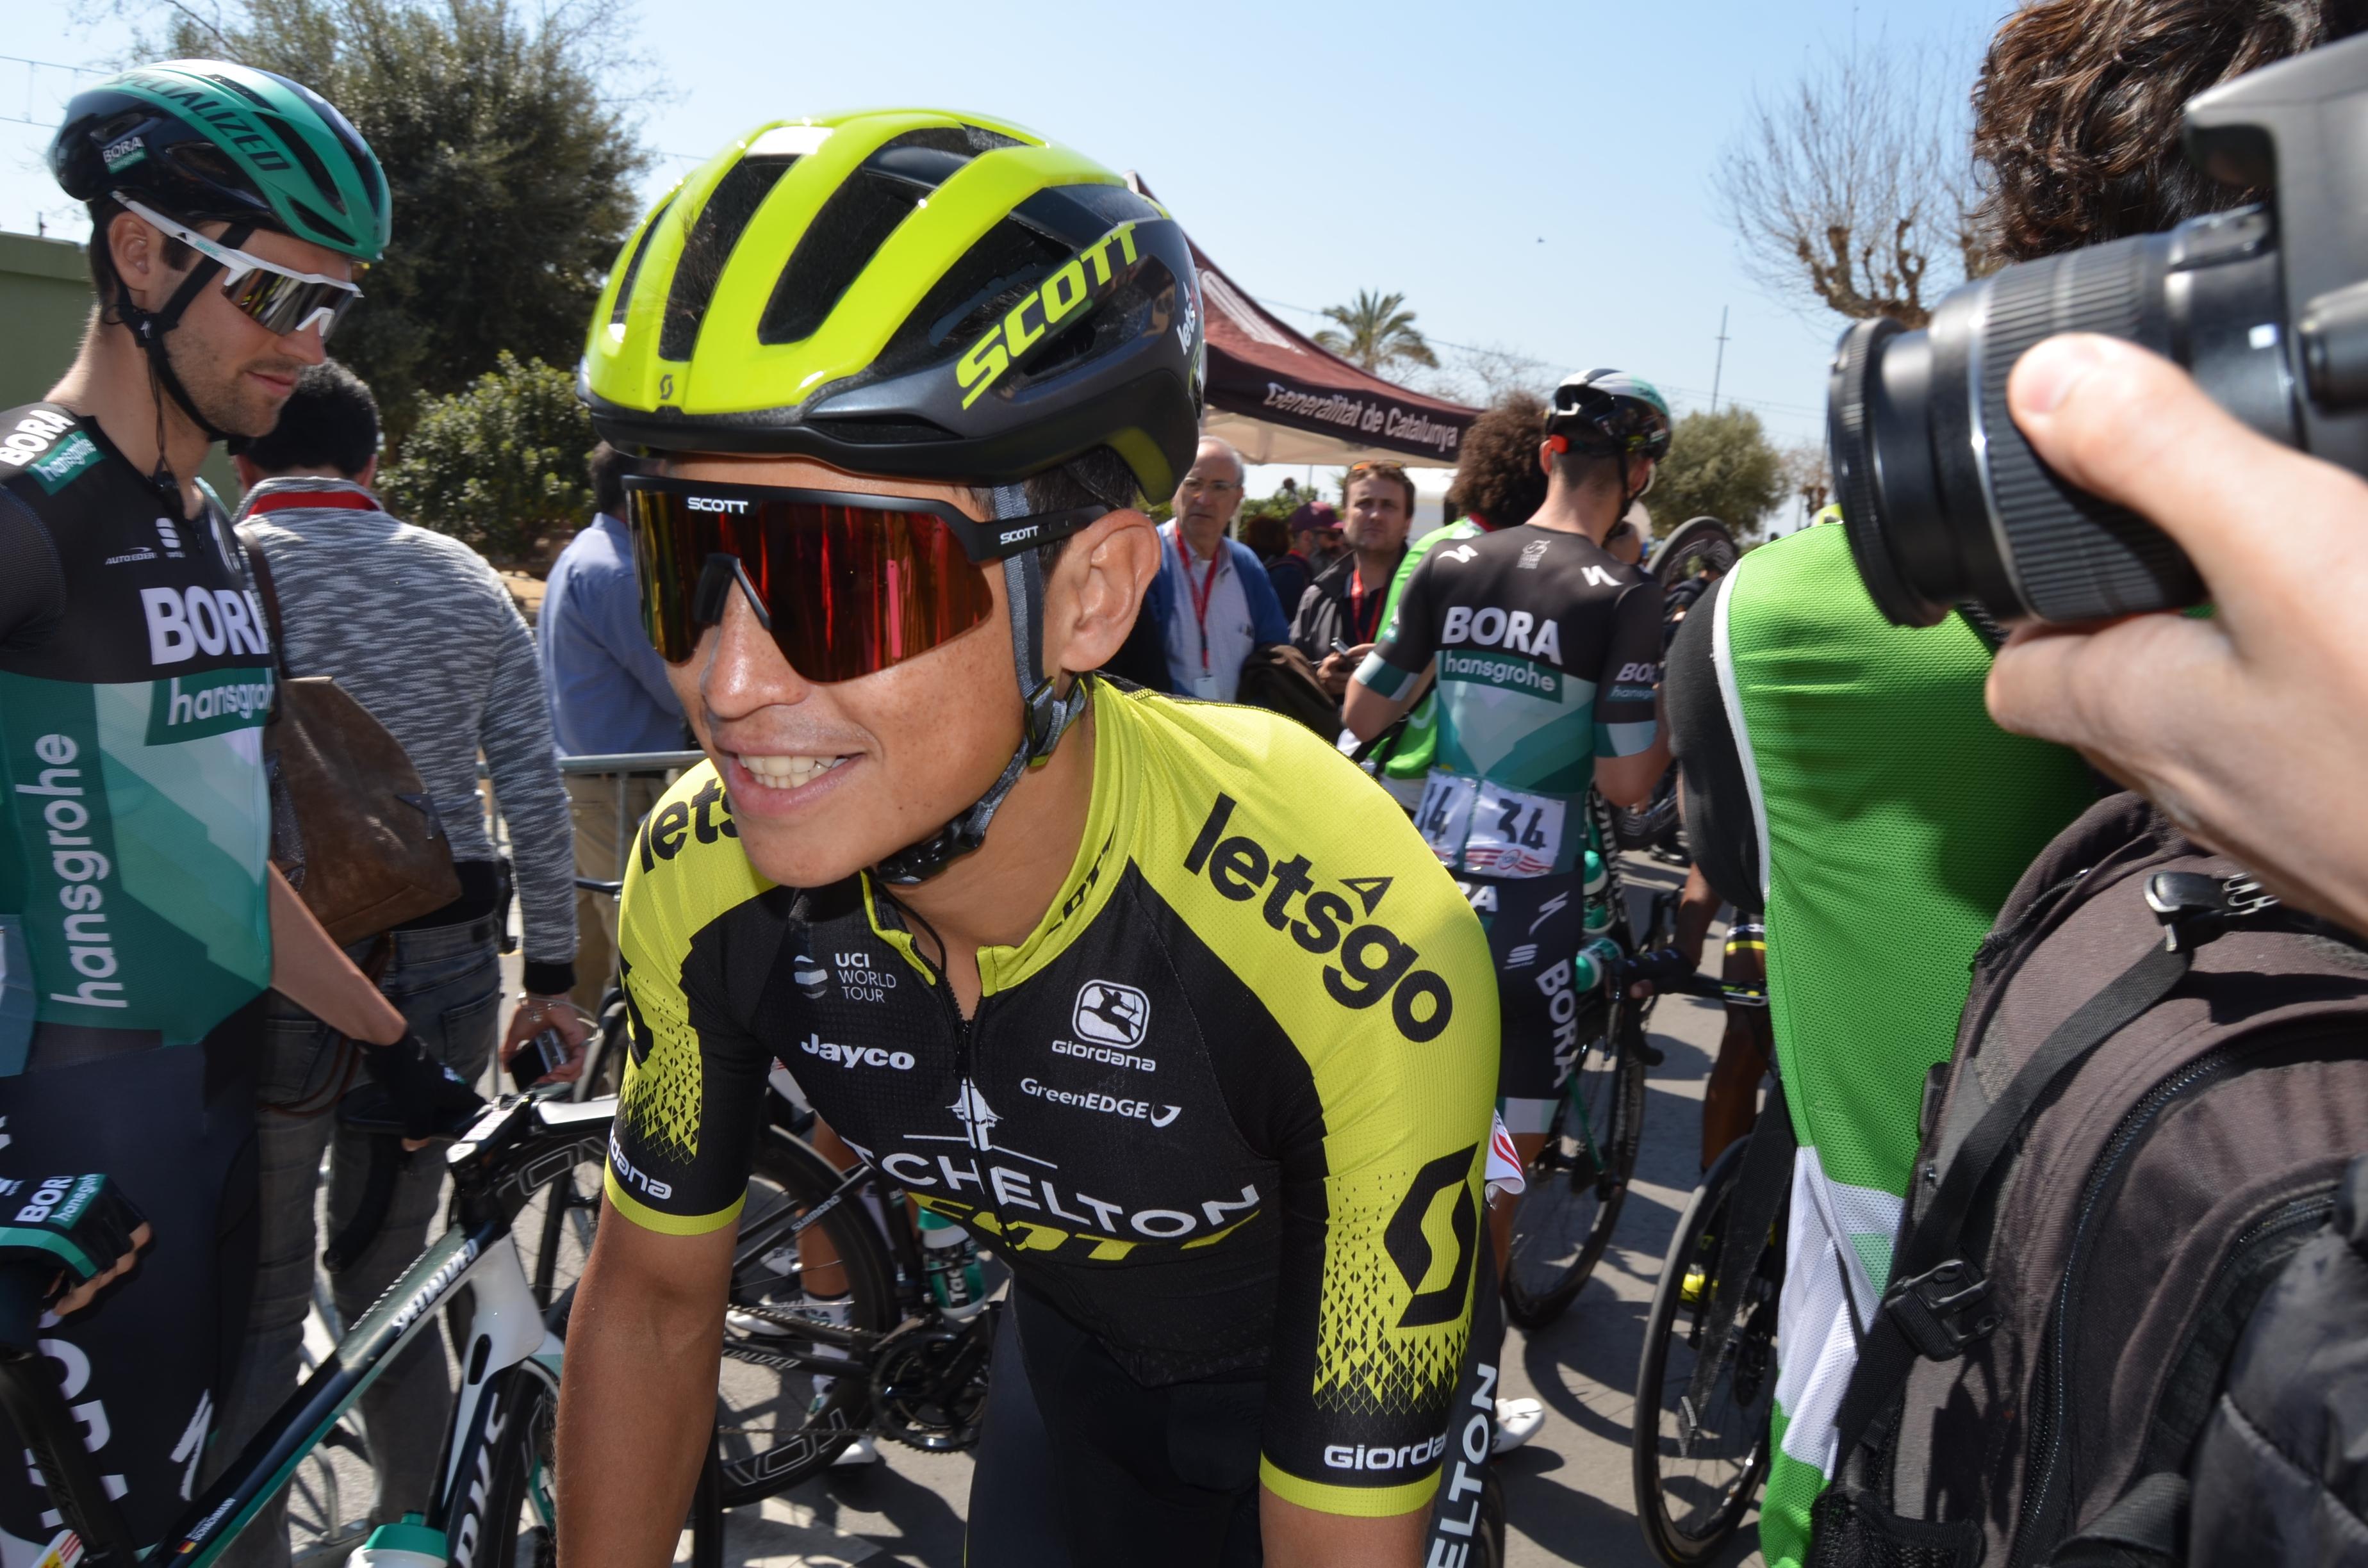 Esteban Chaves ciclismo giro